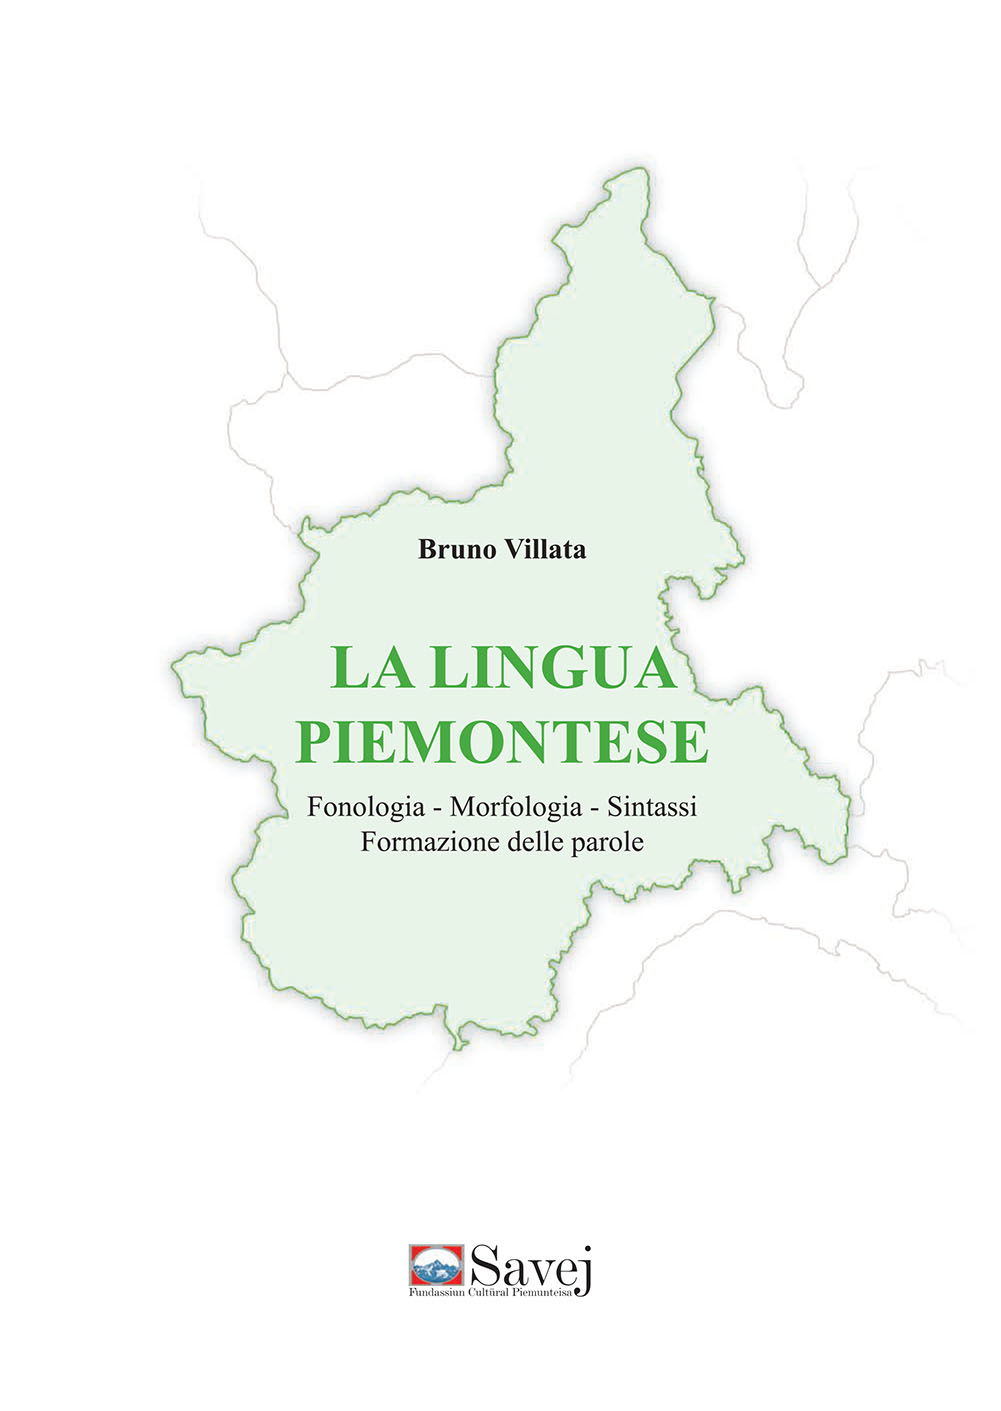 Copertina_la_lingua_piemontese